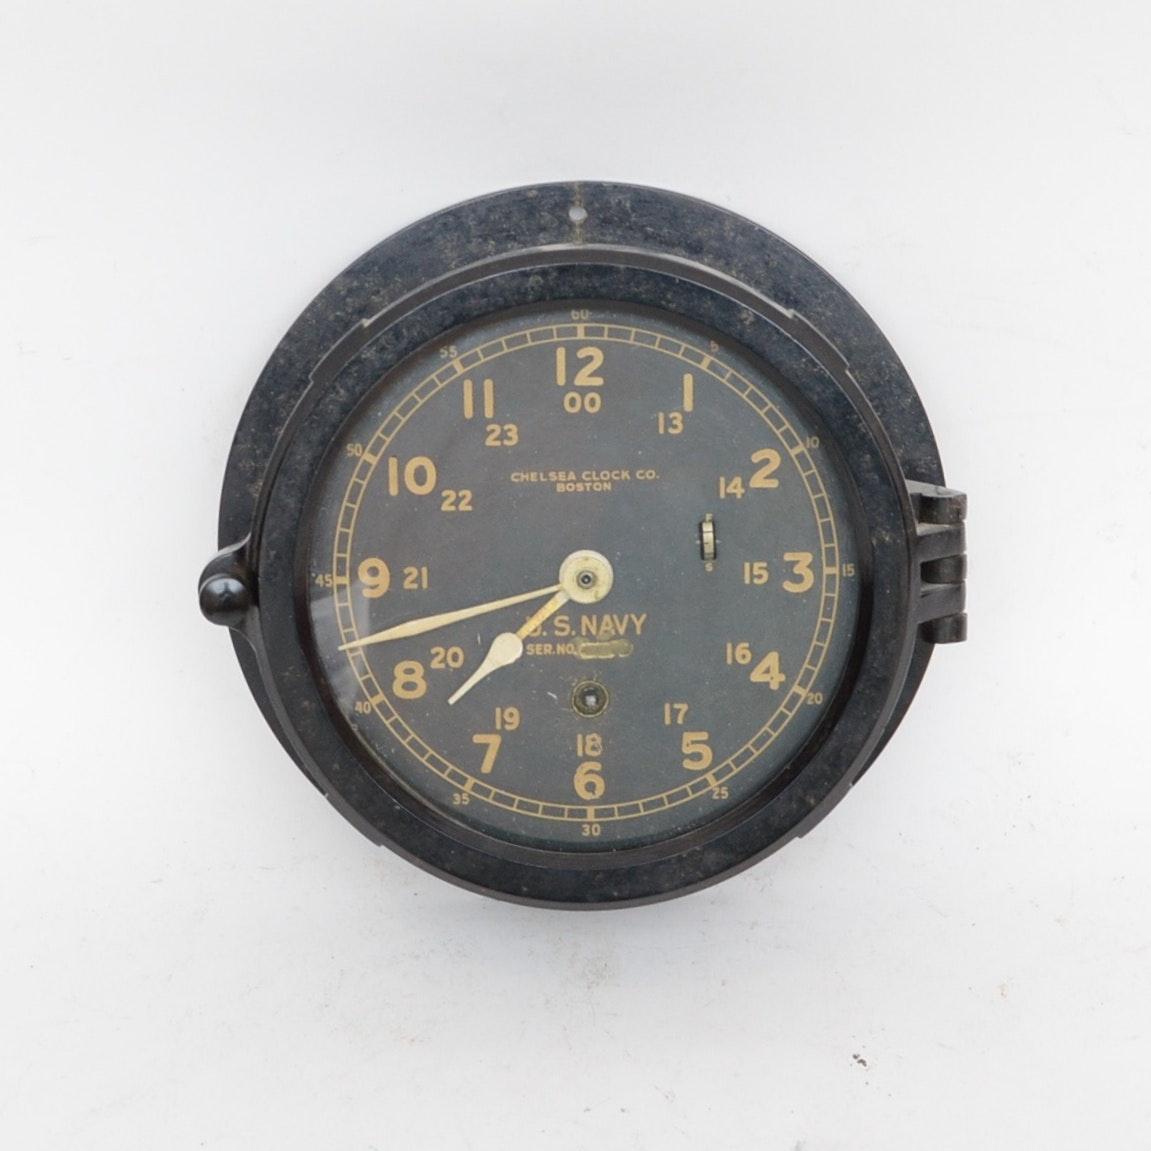 Chelsea Boston U.S. Navy Ship's Clock, circa 1940-1944